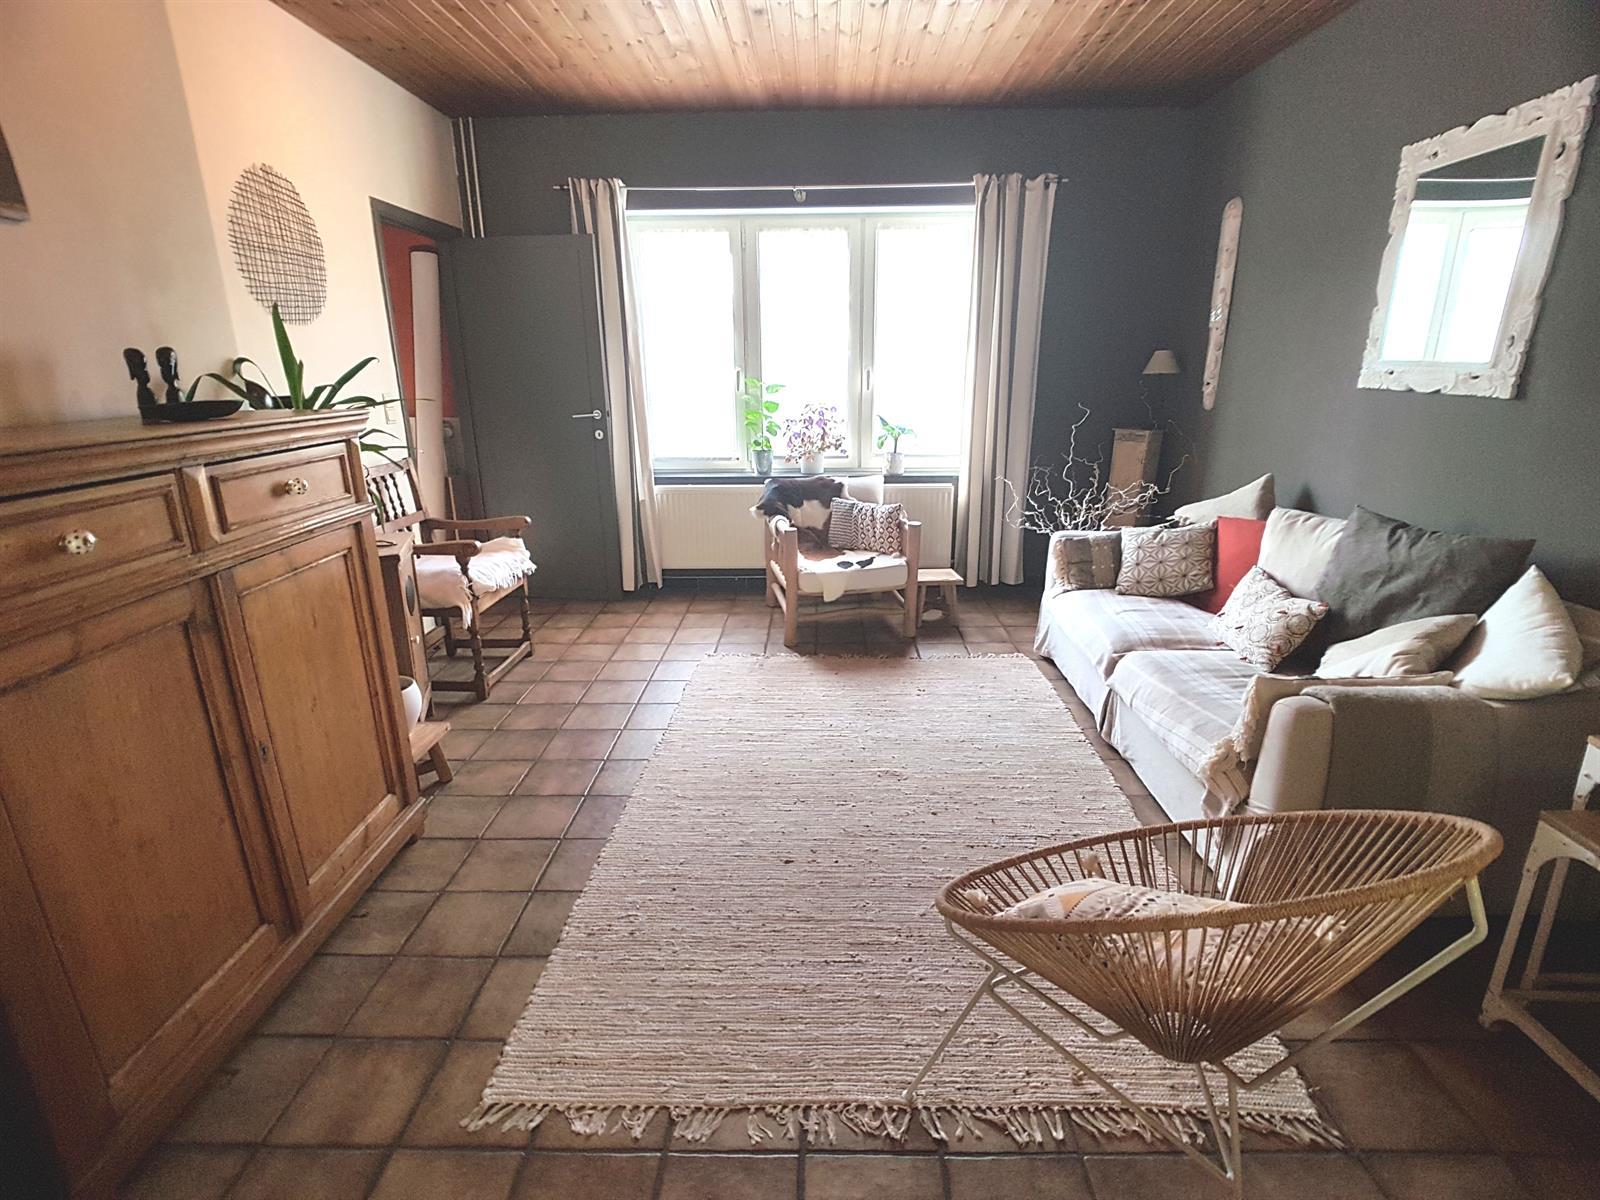 Maison - Ottignies-Louvain-la-Neuve - #4161950-5